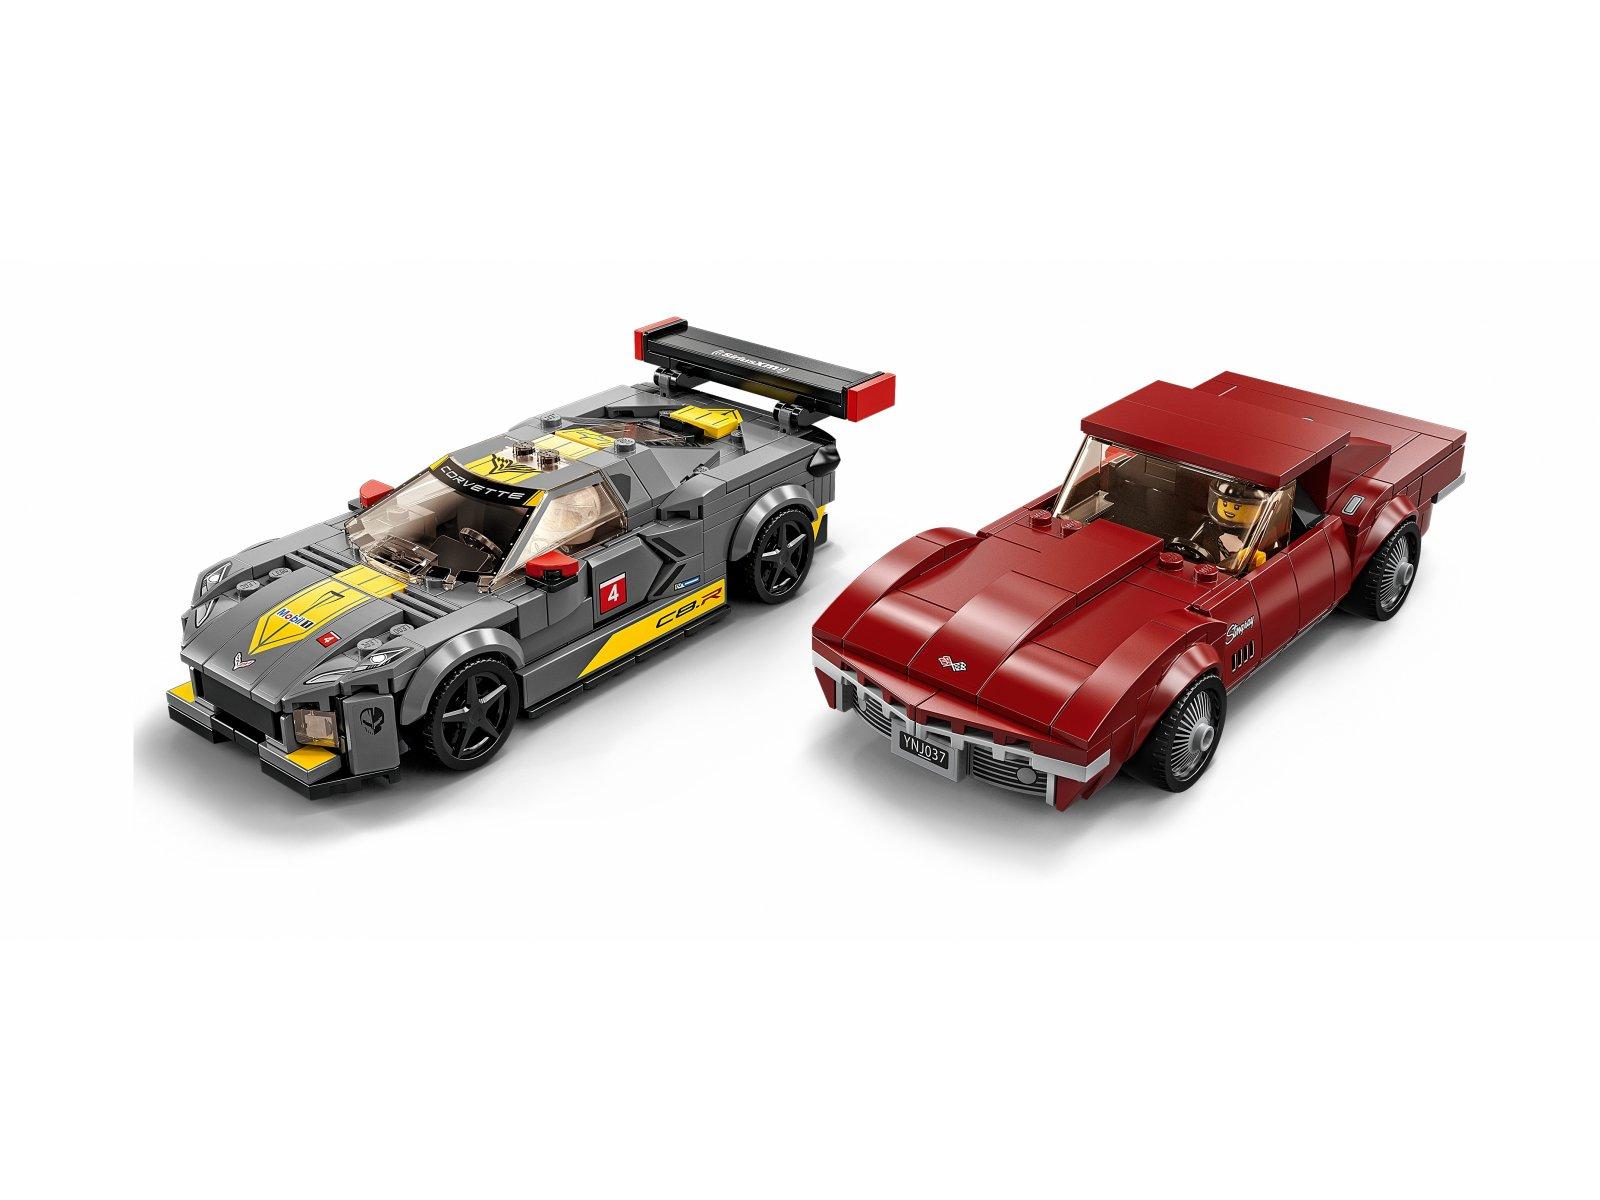 LEGO Speed Champions 76903 Samochód wyścigowy Chevrolet Corvette C8.R i 1968 Chevrolet Corv